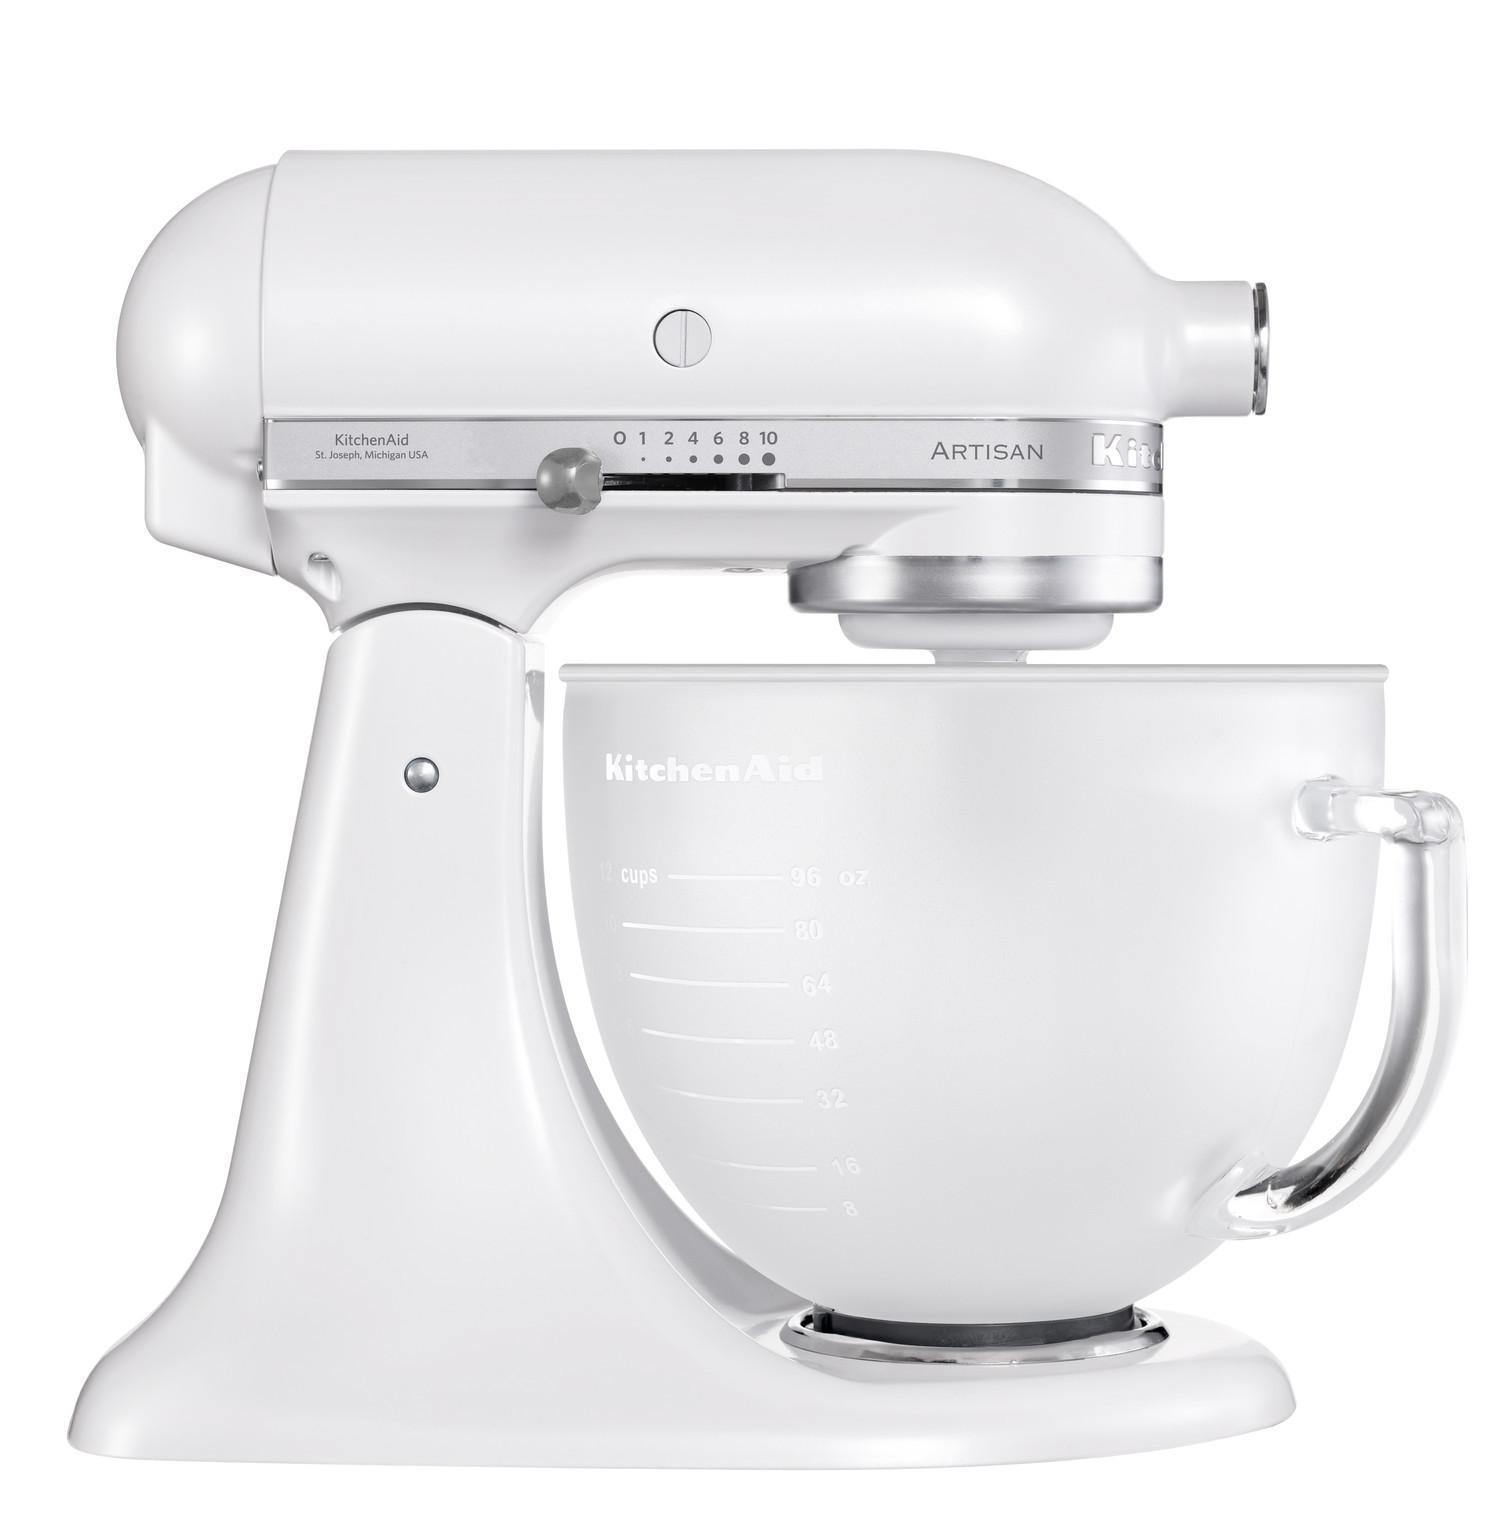 KitchenAid Artisan Küchenmaschine 4,8l Frosted Pearl